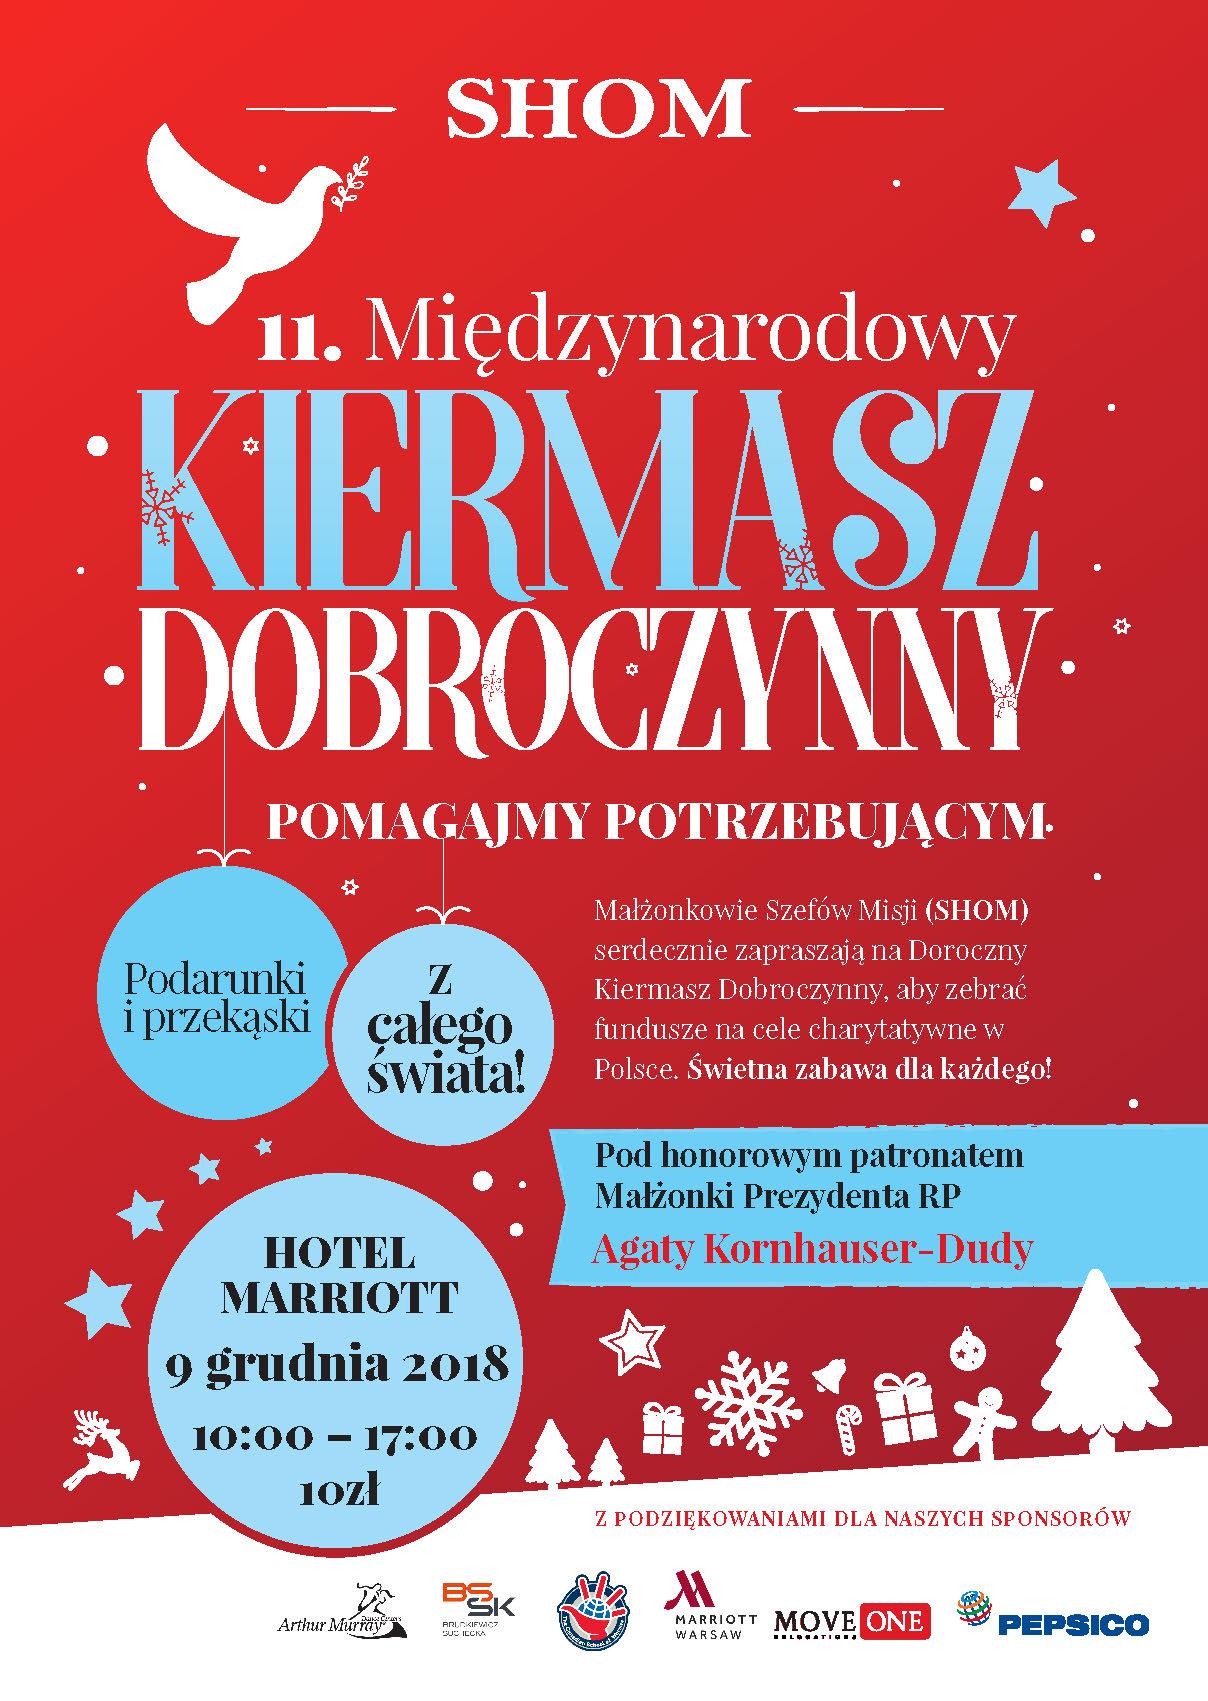 http://m.wm.pl/2018/12/orig/bazaar-poster-2018-polish-513473.jpg